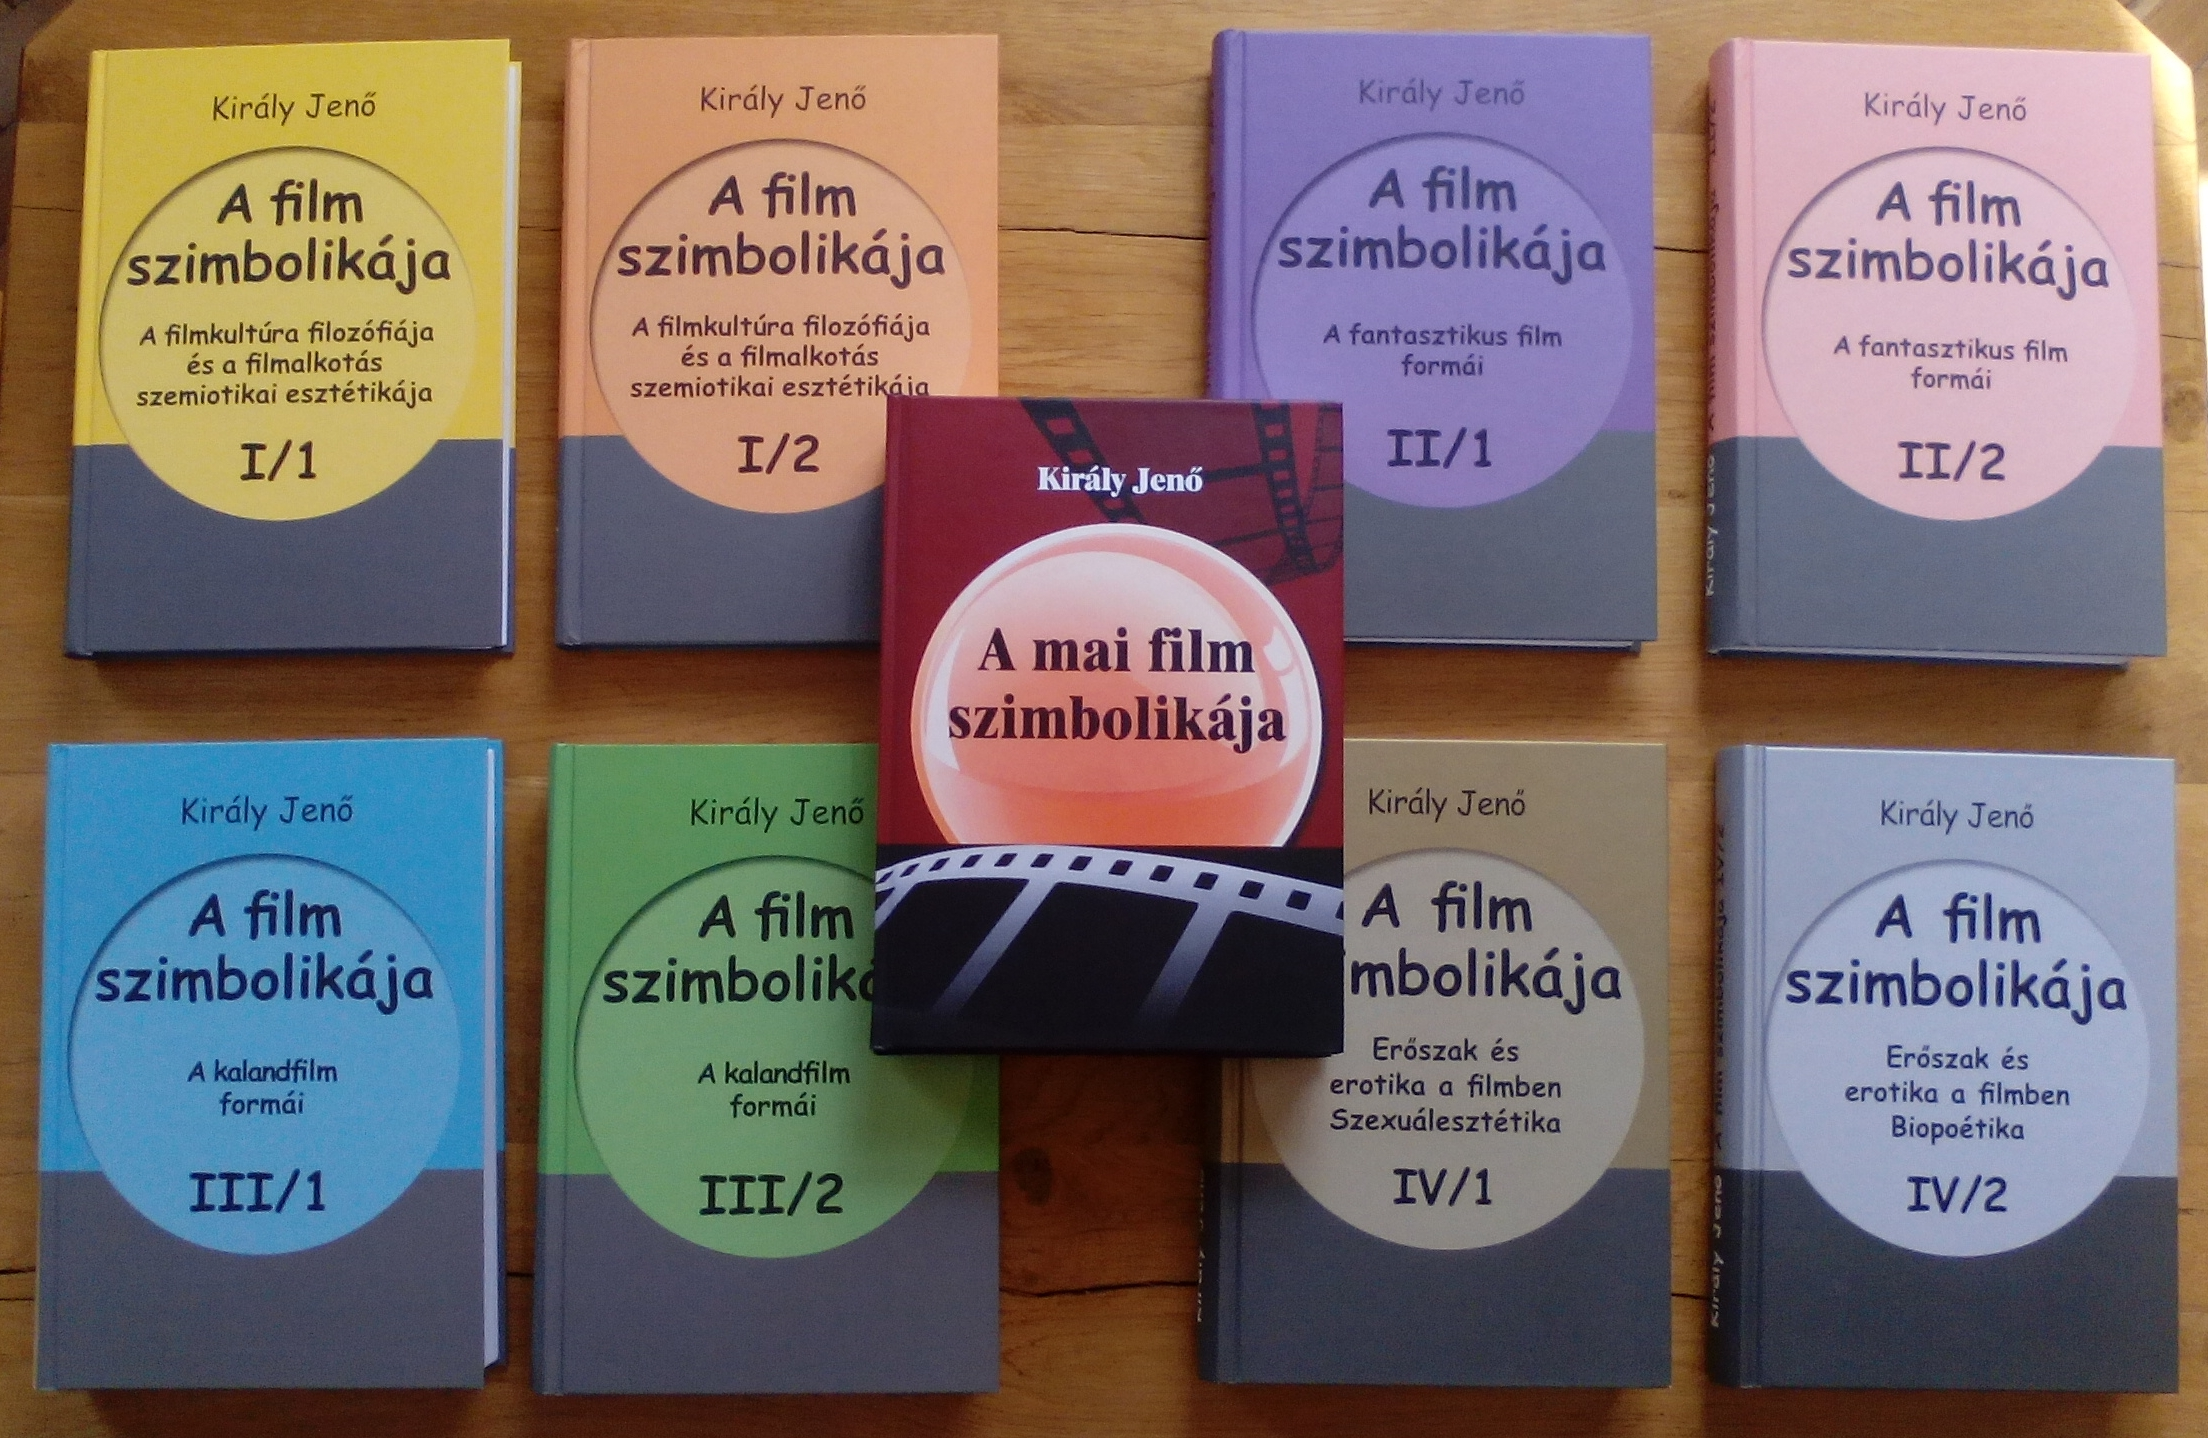 film_szimbolikaja.jpg